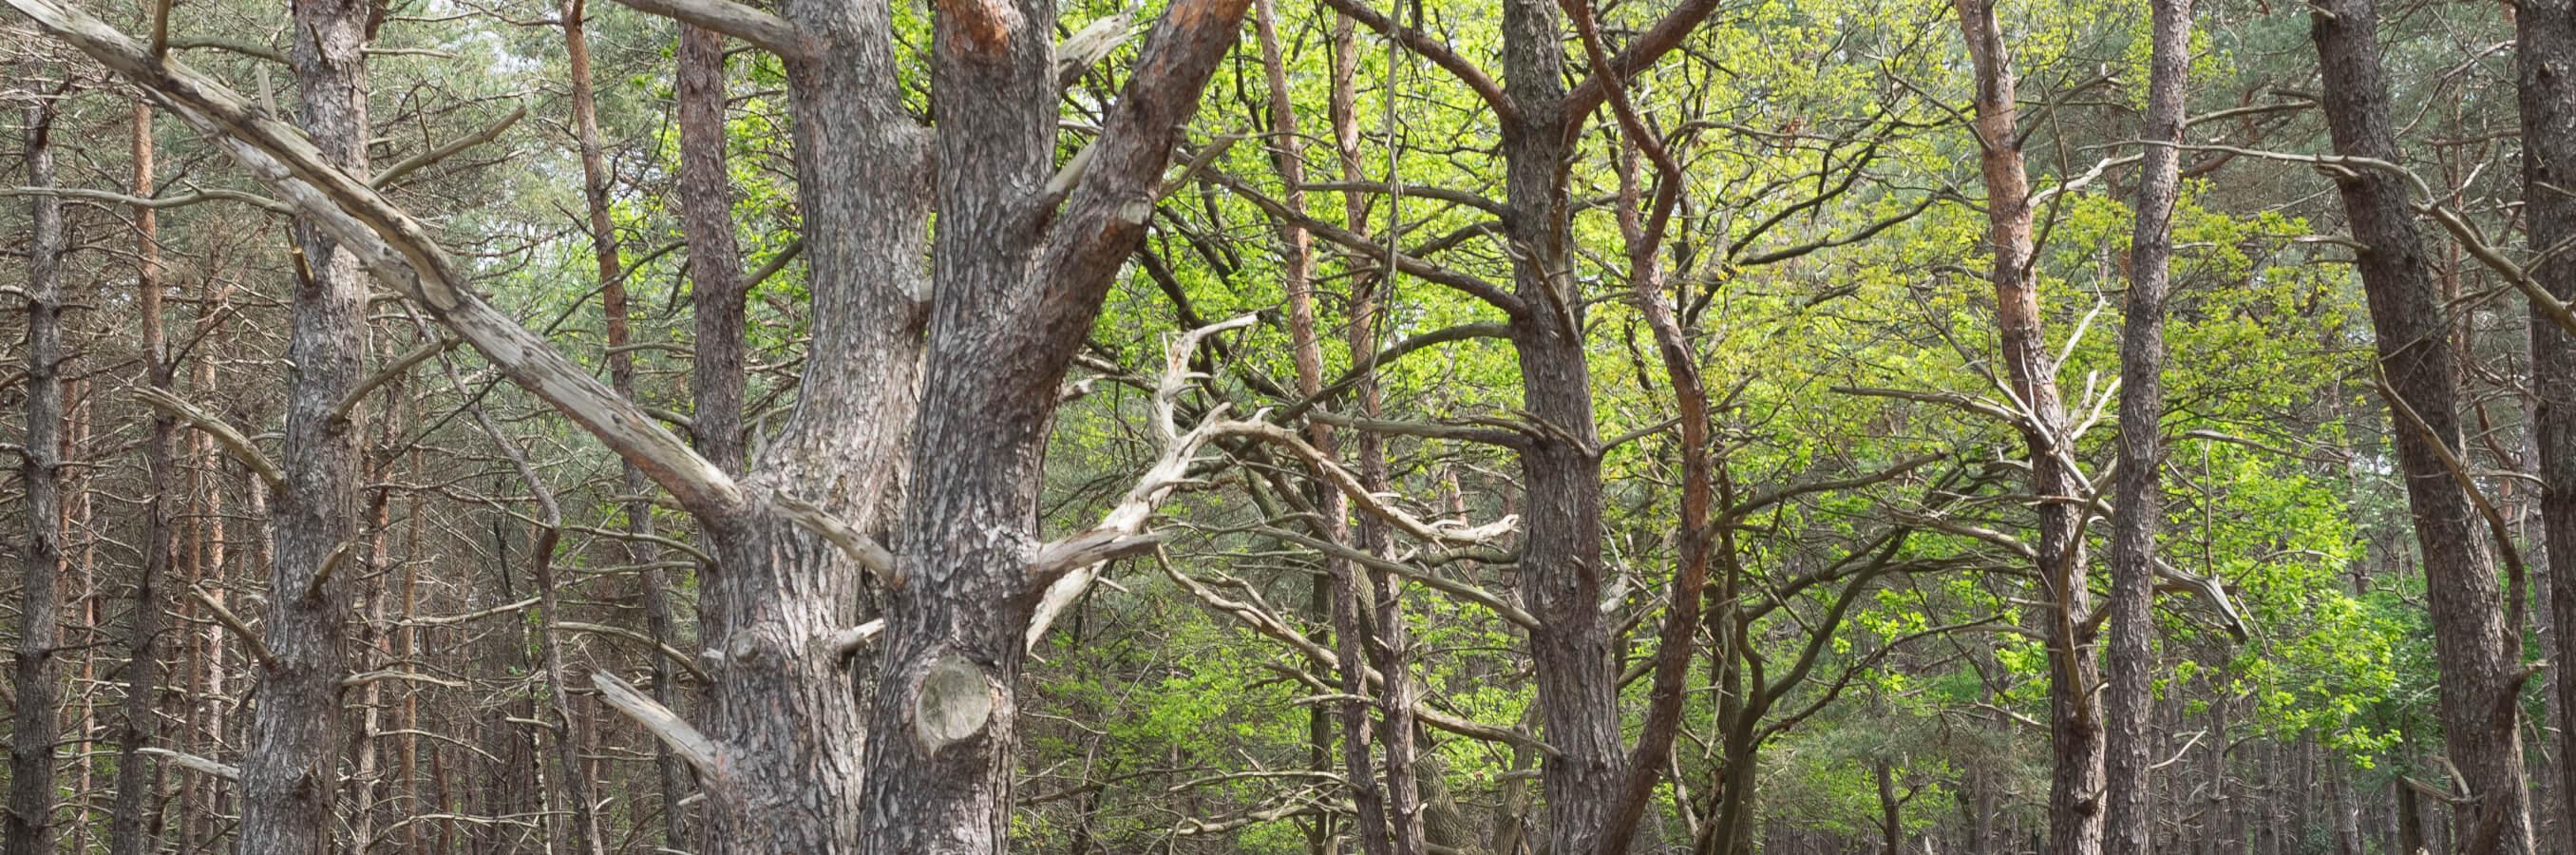 Bussum heide bomen nabij locatie mindfulness training